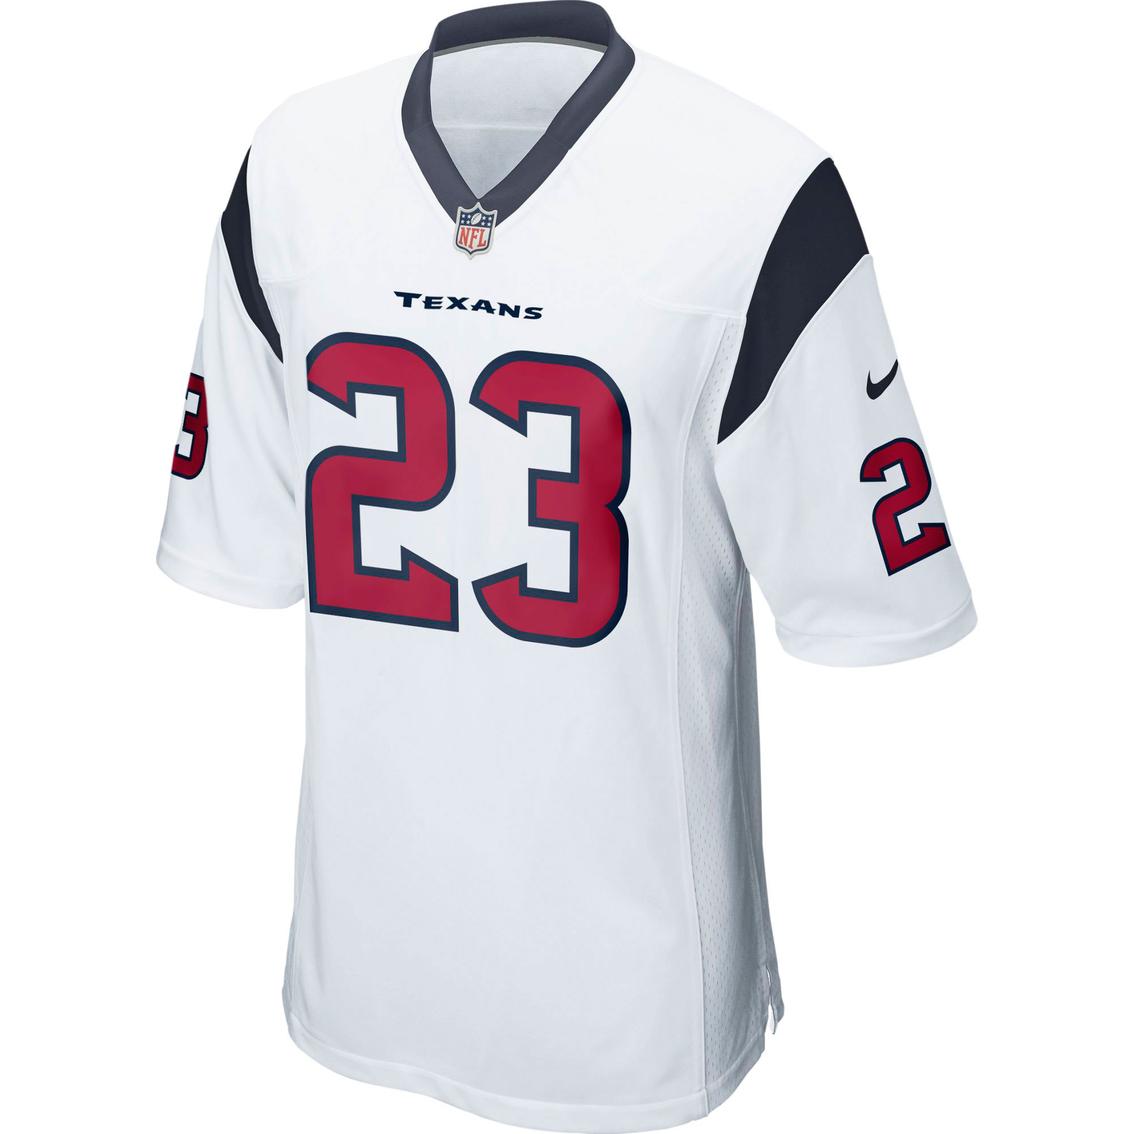 4487265d71dd4f Nike Nfl Houston Texans Men's Foster Game Jersey | Jerseys | Sports ...